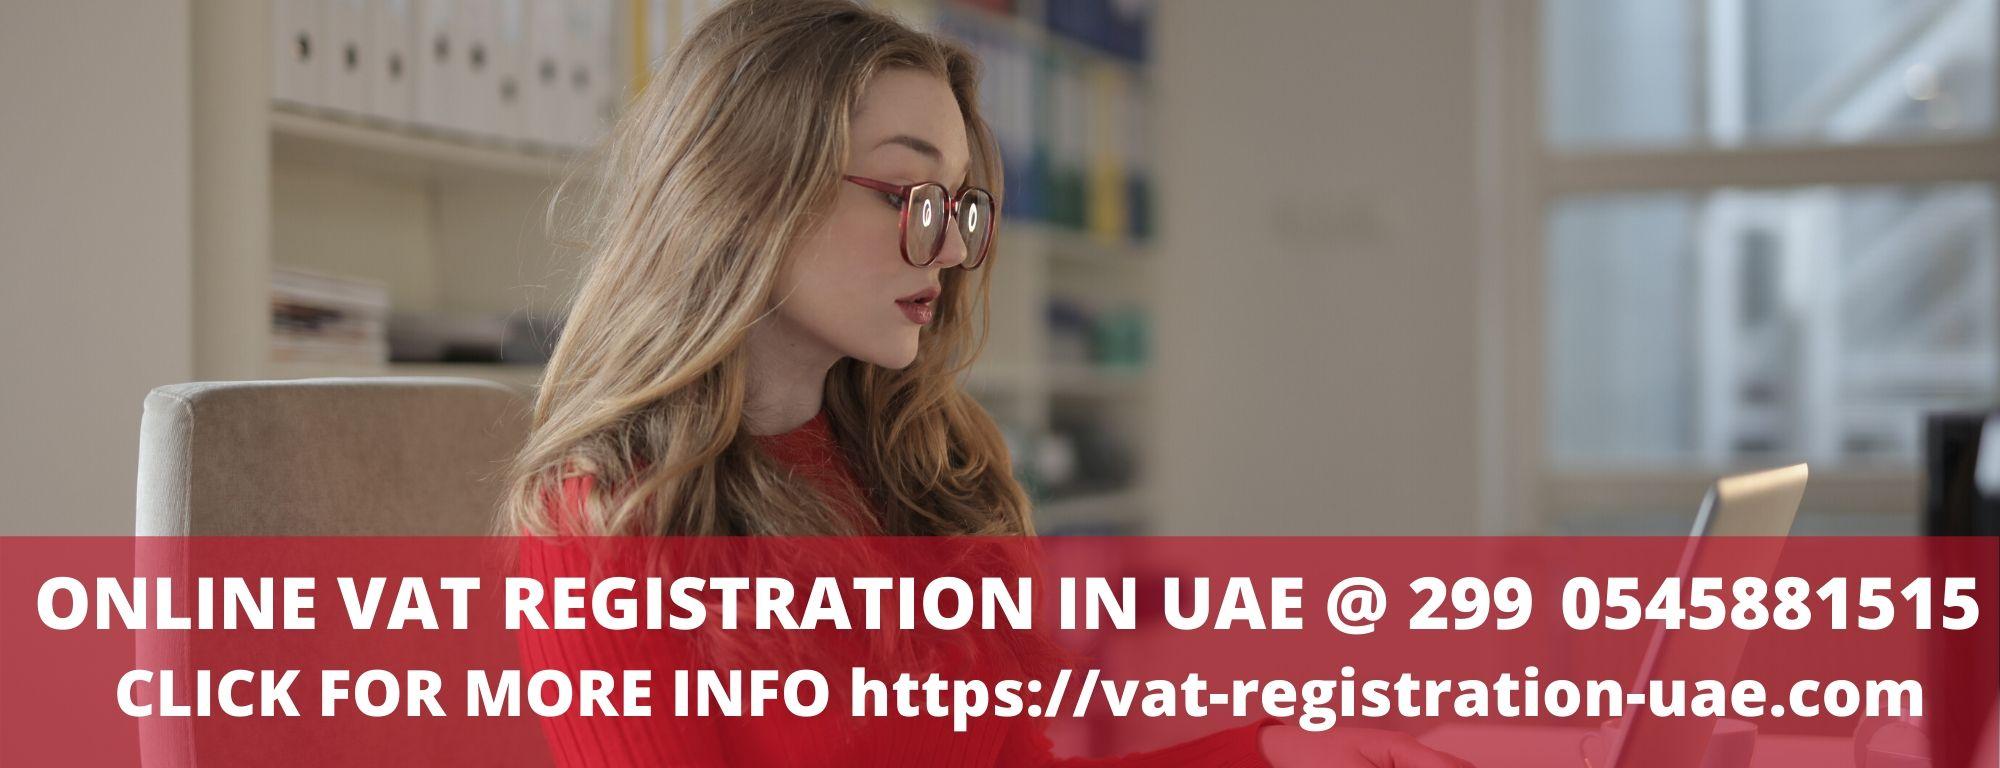 vat-registration-uae